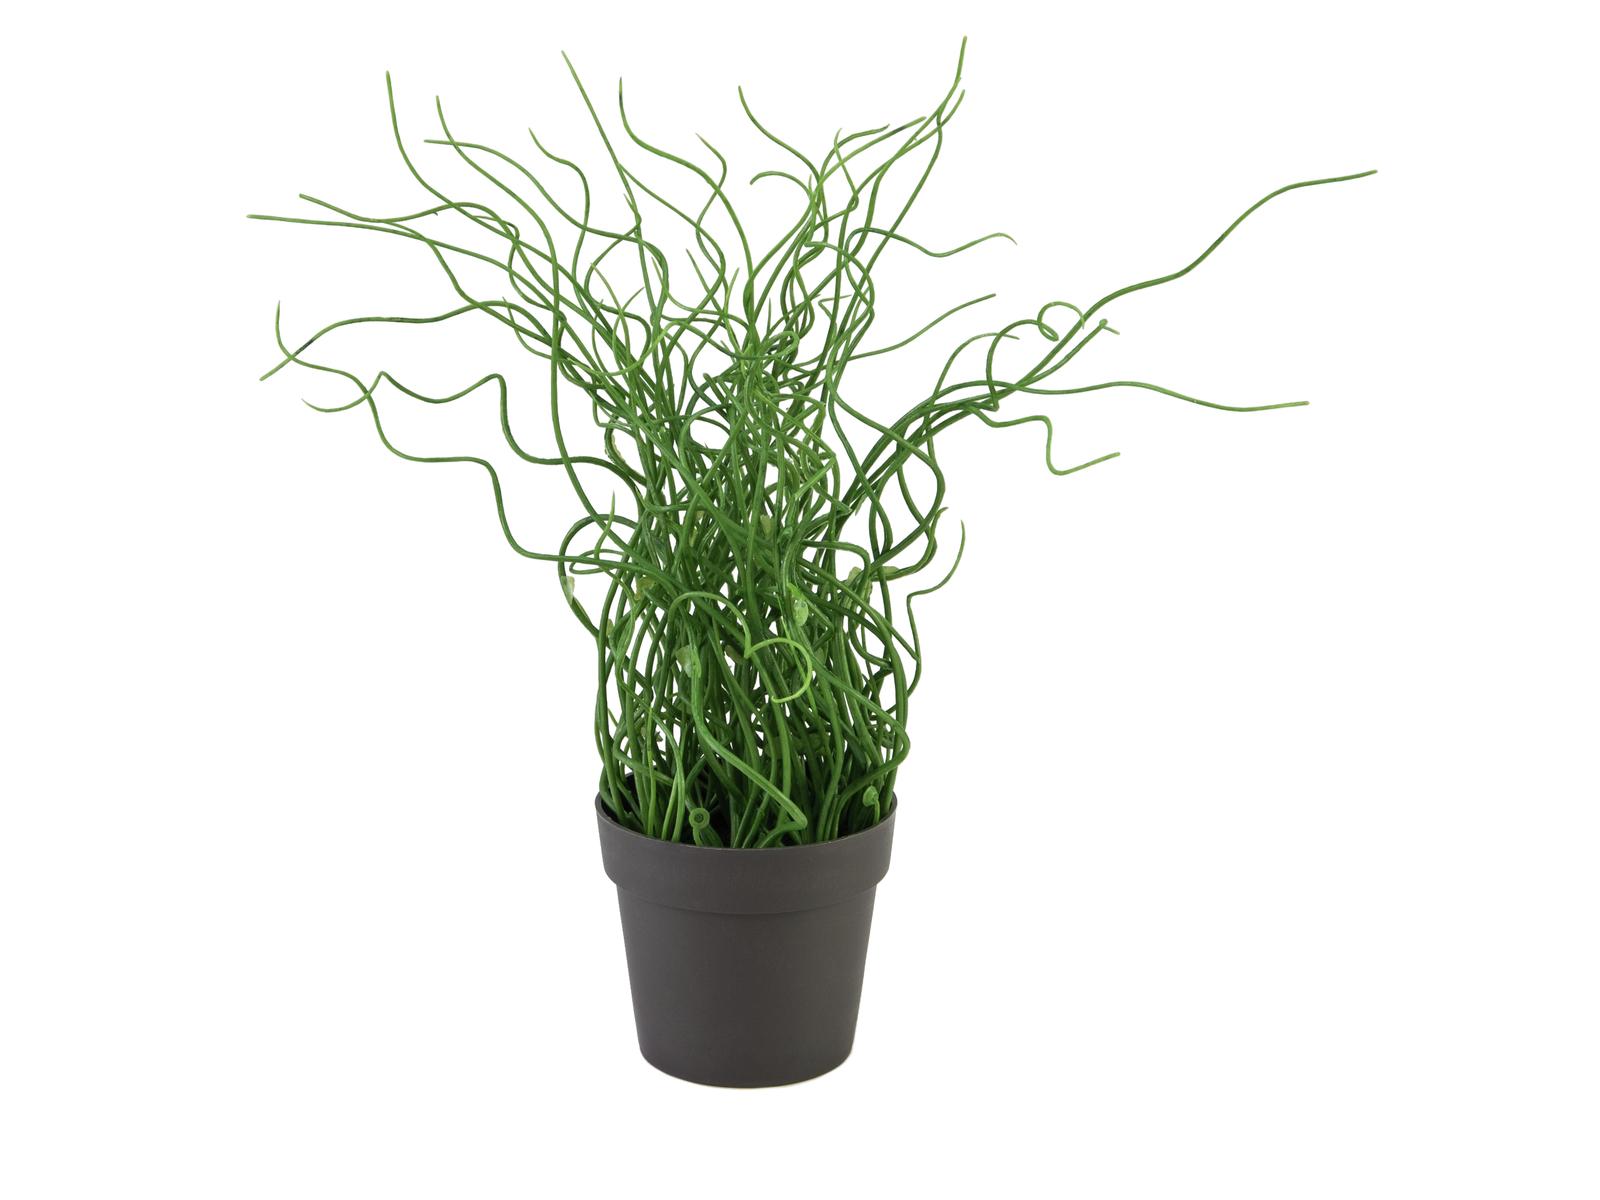 EUROPALMS Korkenzieher-Gras im braunen Topf, PE, Kunstpflanze, 38cm